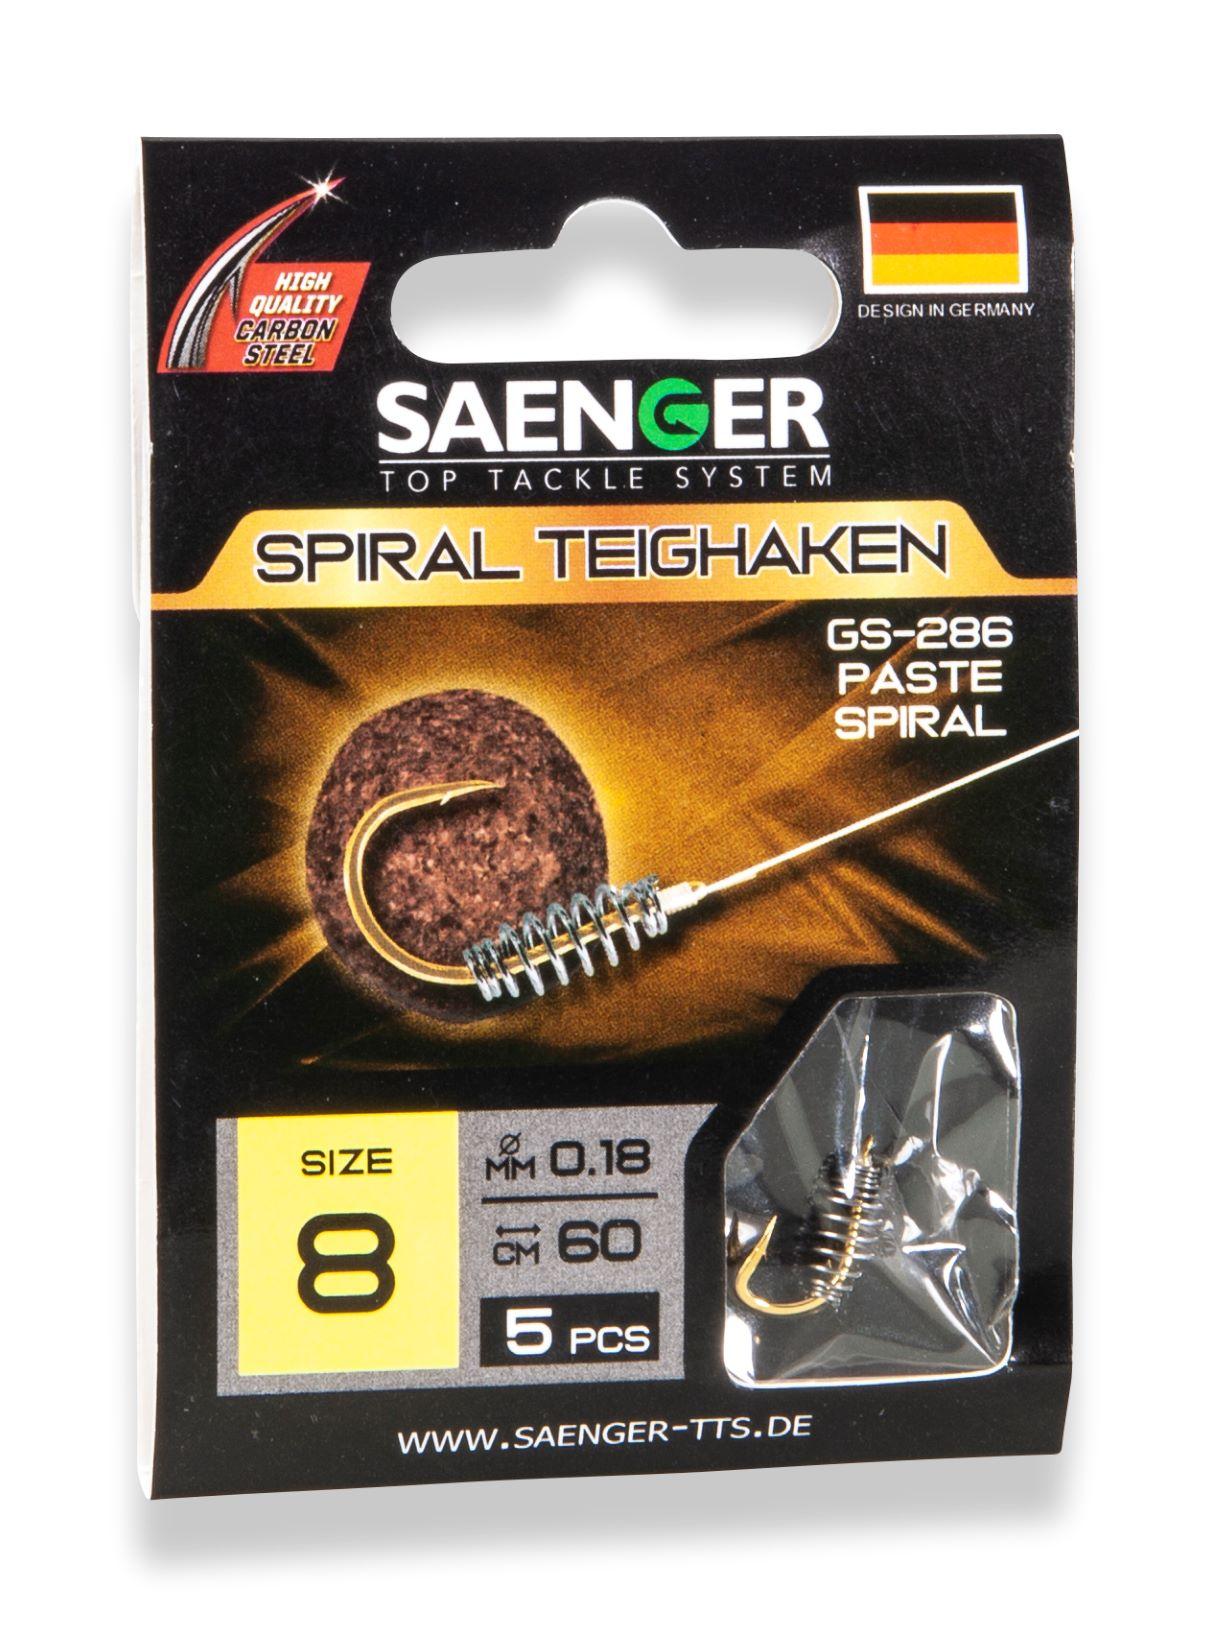 Saenger Návazec pro lov s těstem (háček se spirálou) Teighaken GS-286 vel. 6, 5 ks/bal